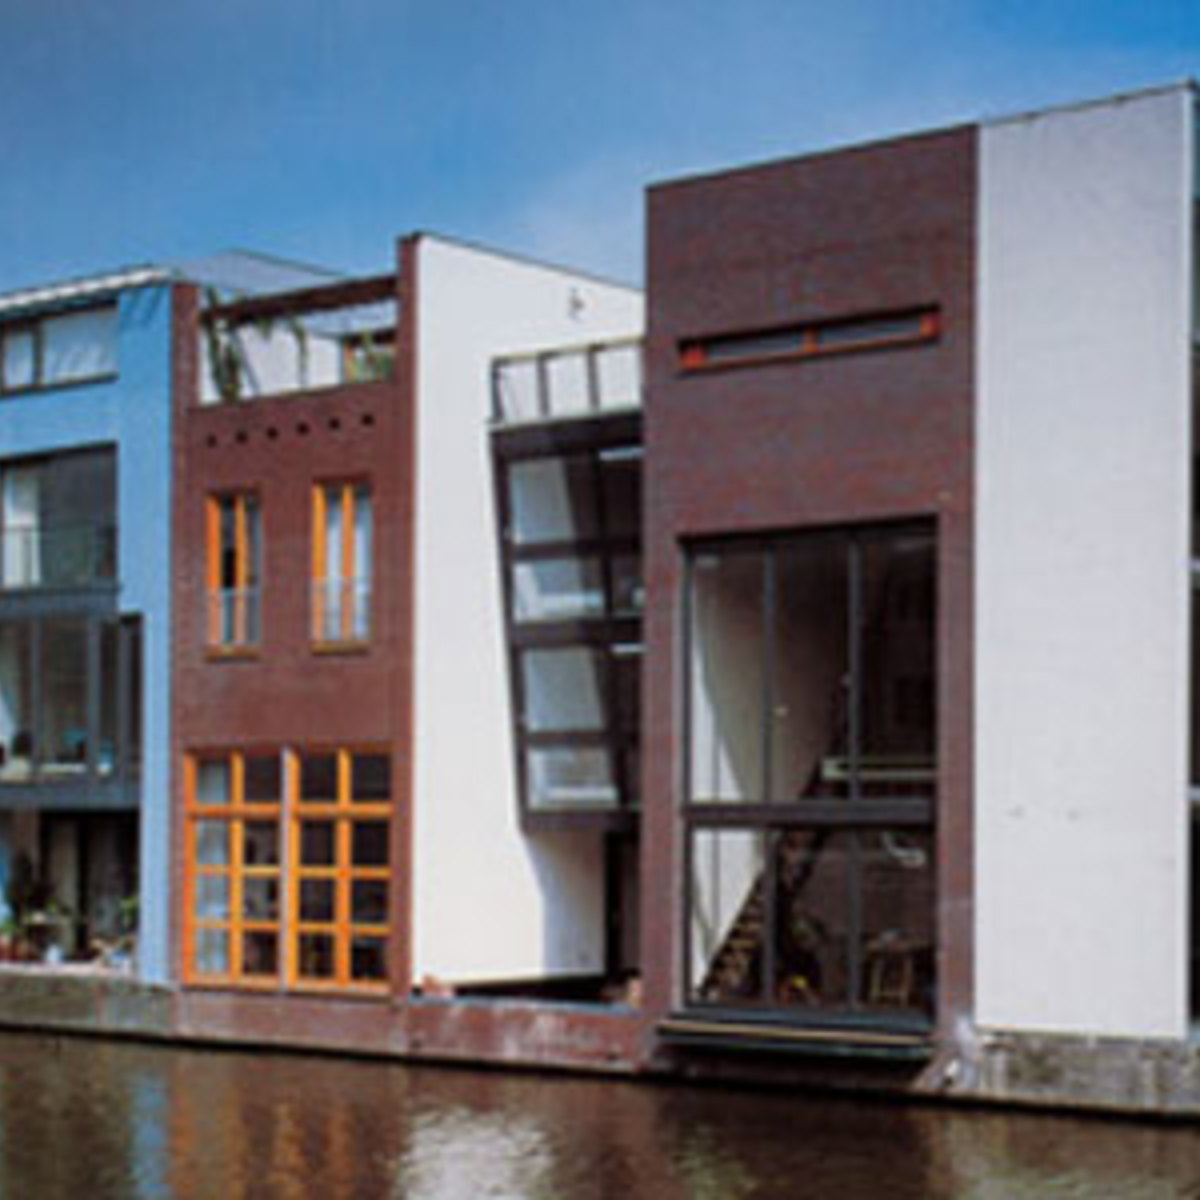 University Of Amsterdam Dorms: Two Houses Amsterdam MVRDV 2000